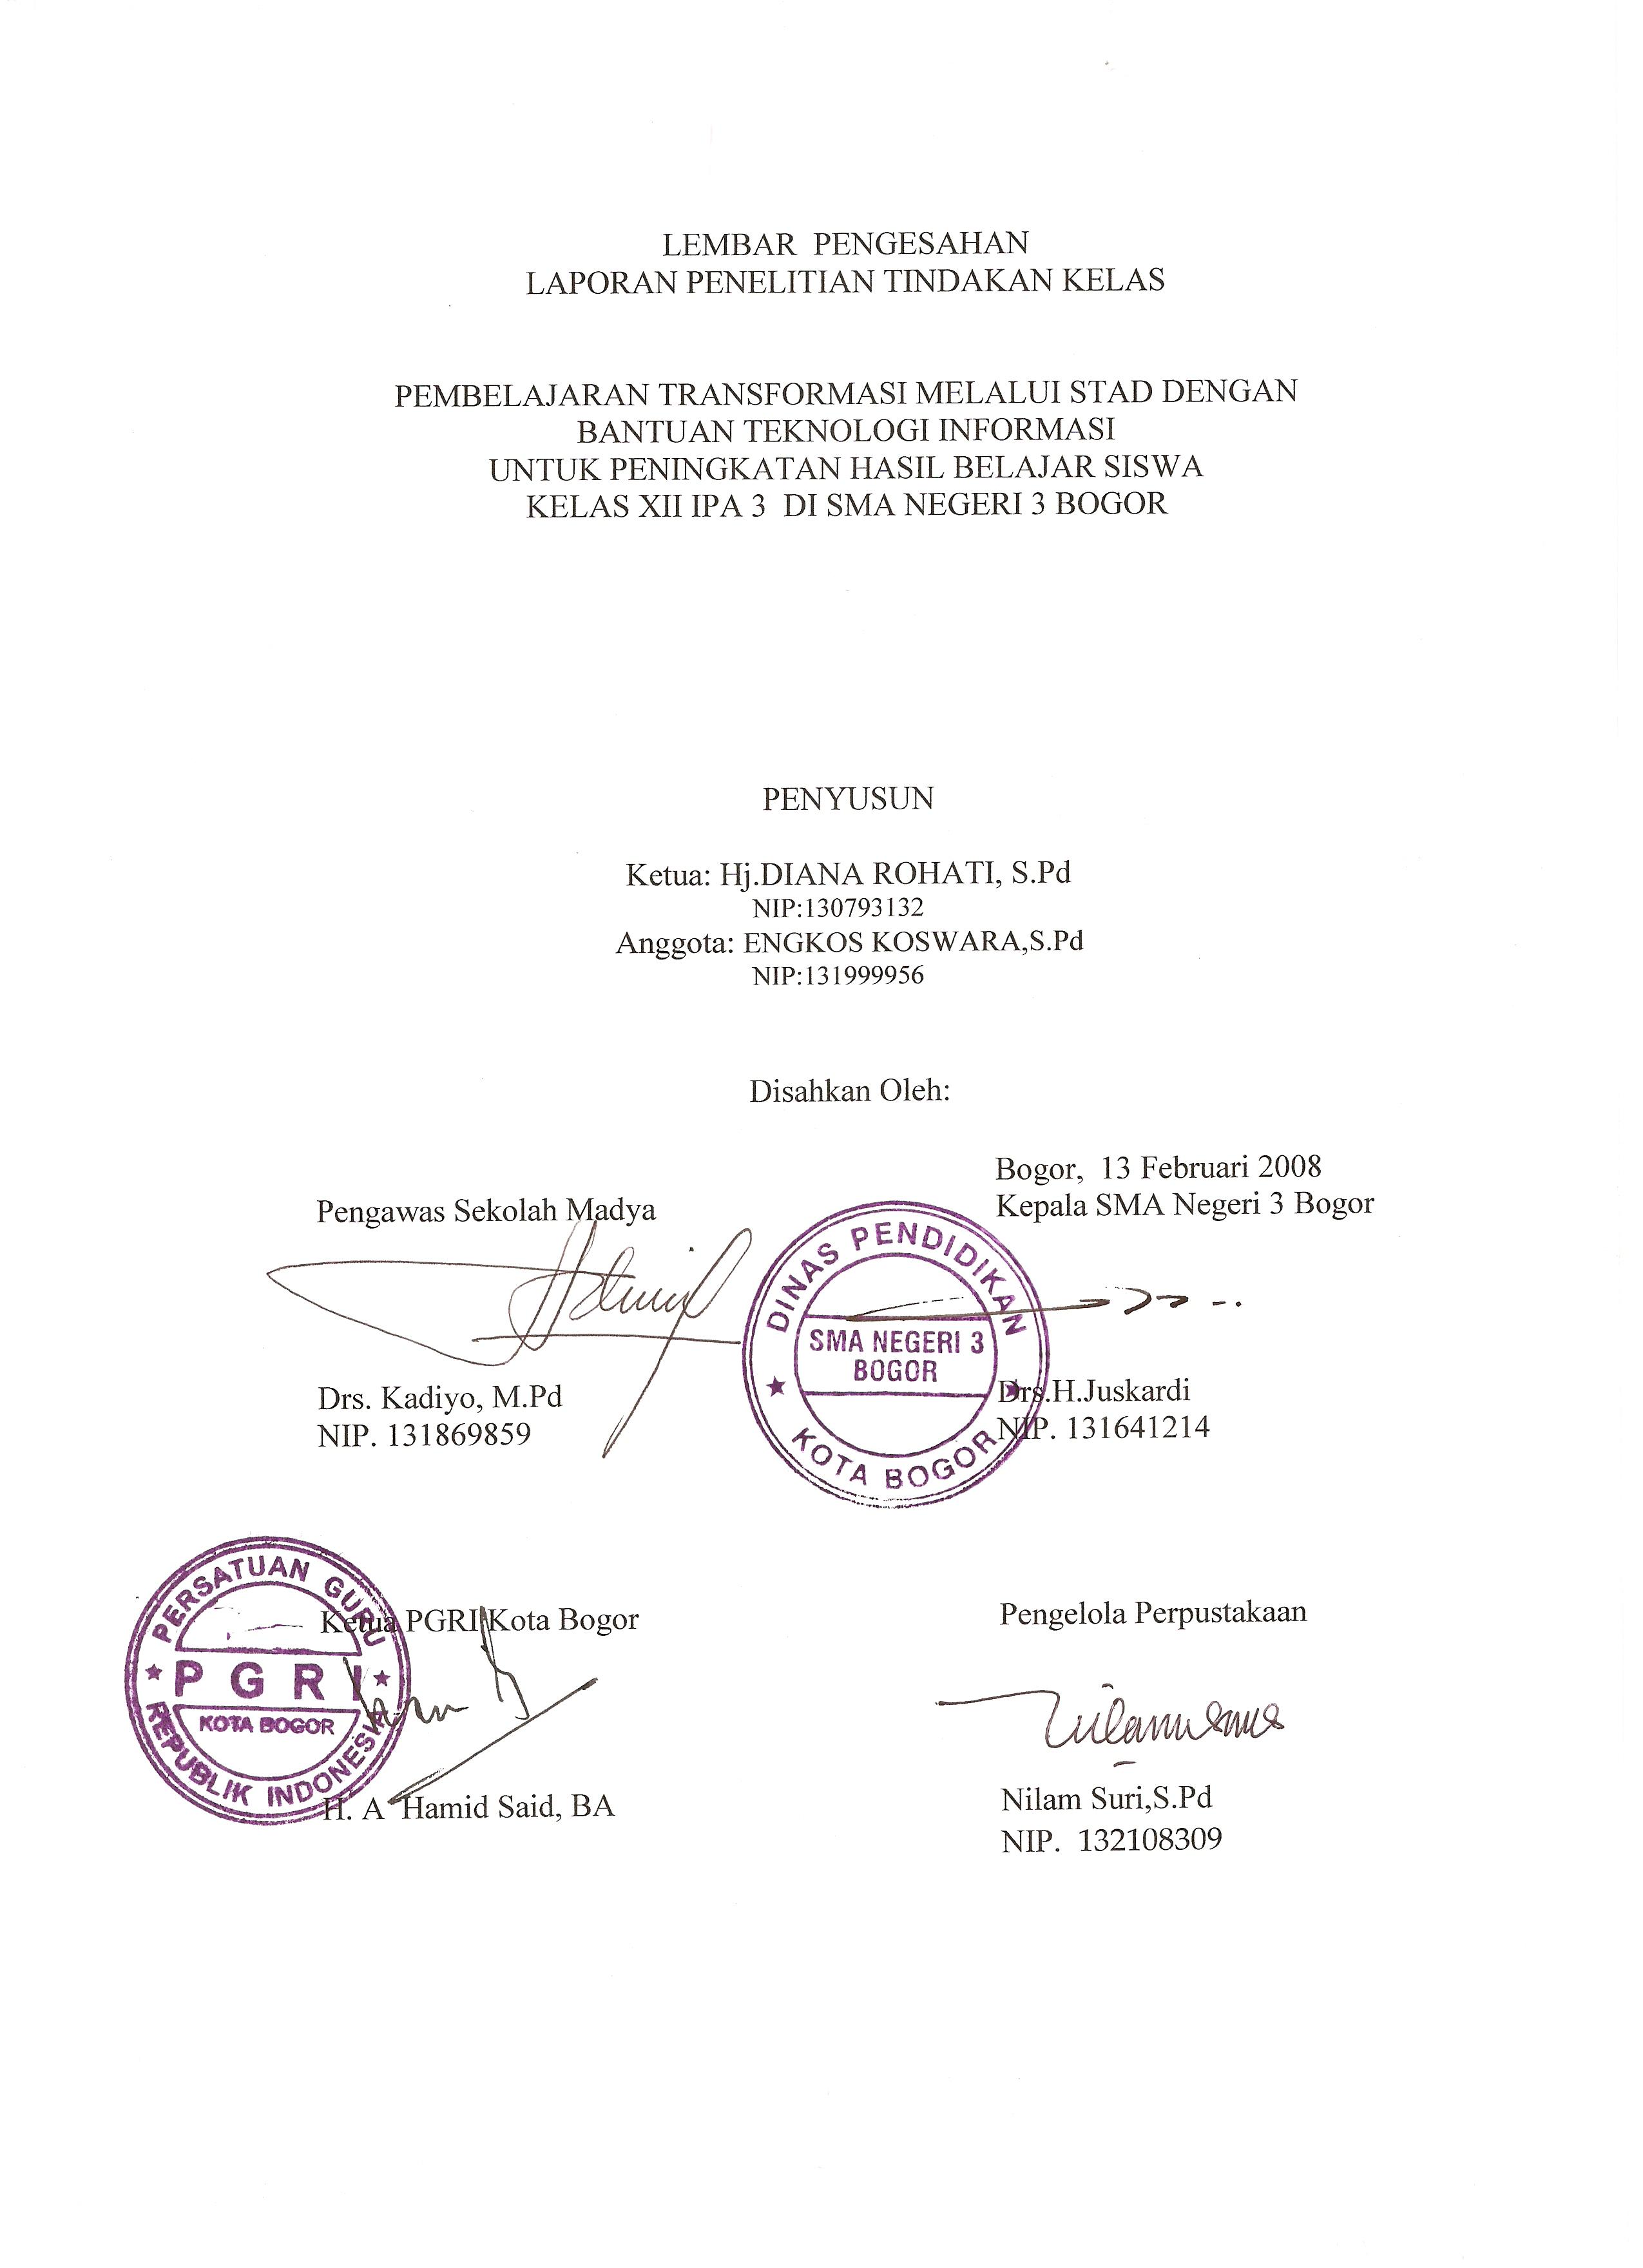 Makalah Contoh Laporan Pkl Akuntansi Contoh Judul Karya Tulis Ilmiah Dalam Bentuk Makalah Jpeg Lembar Pengesahan Laporan Ptk 187; Lembar Pengesahan Laporan Ptk